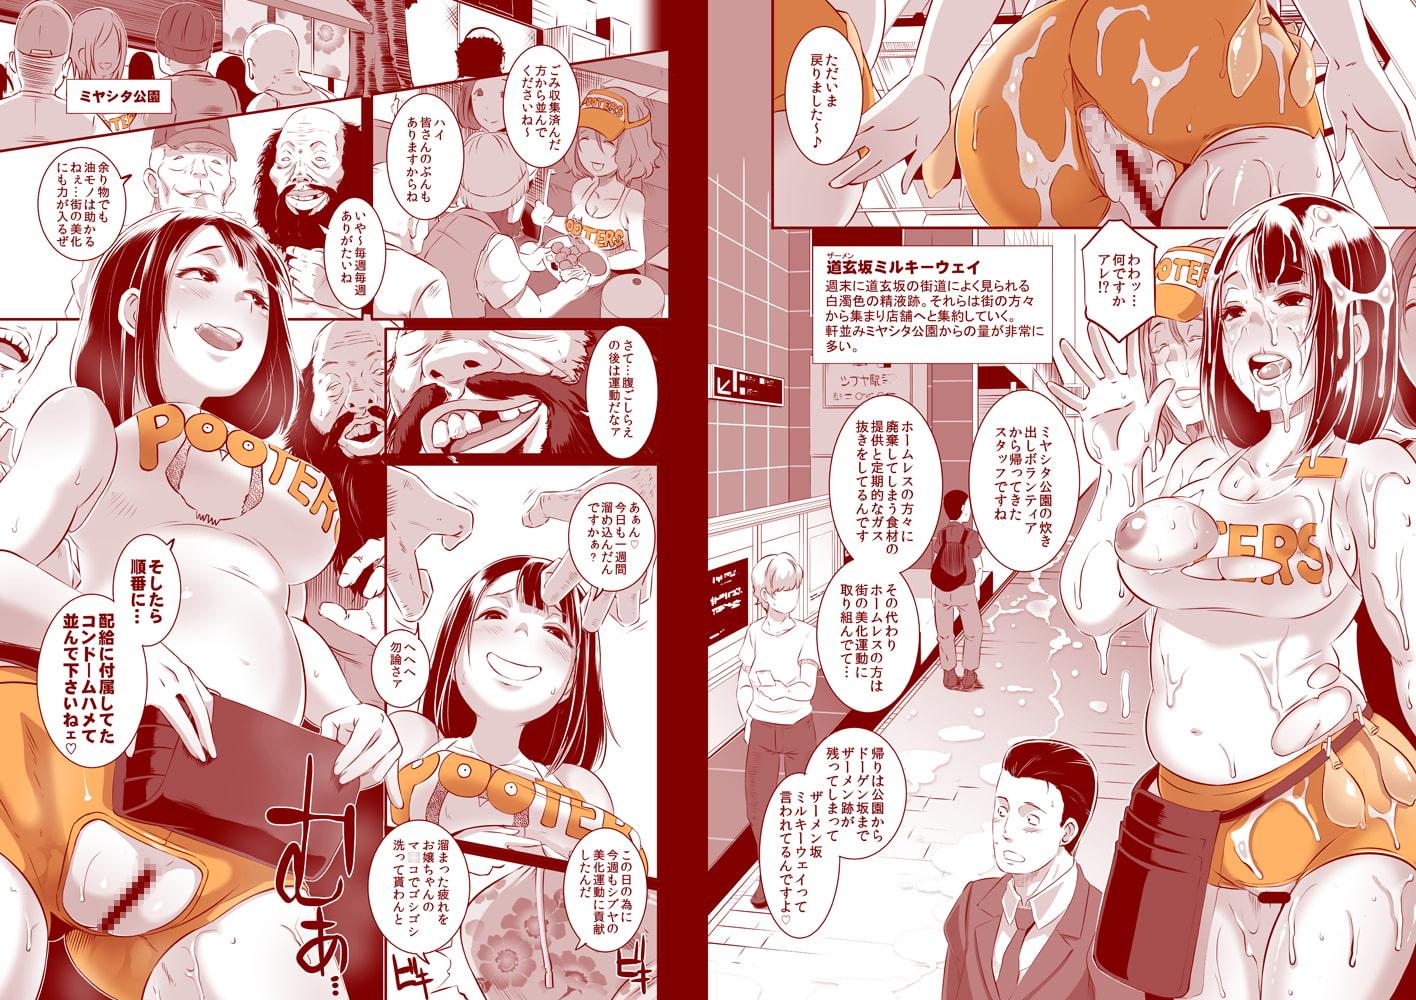 DELIGHTFULLY FUCKABLE AND UNREFINED in Shibuya!!_DL版